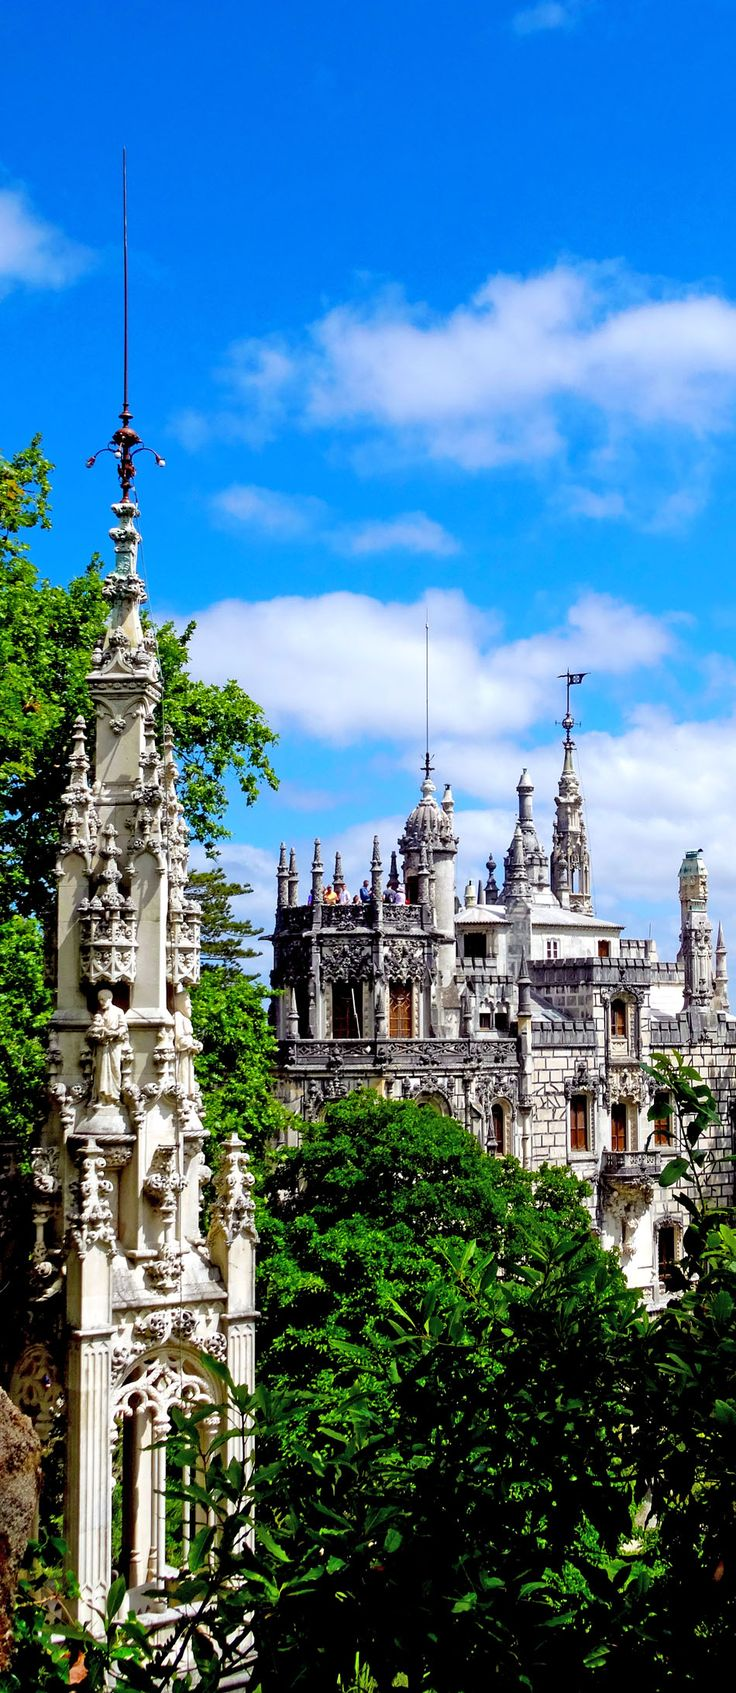 Gorgeous Quinta da Regaleira Palace in Sintra, Portugal   Travel Impressions From Lisbon, Cidade Vibrante